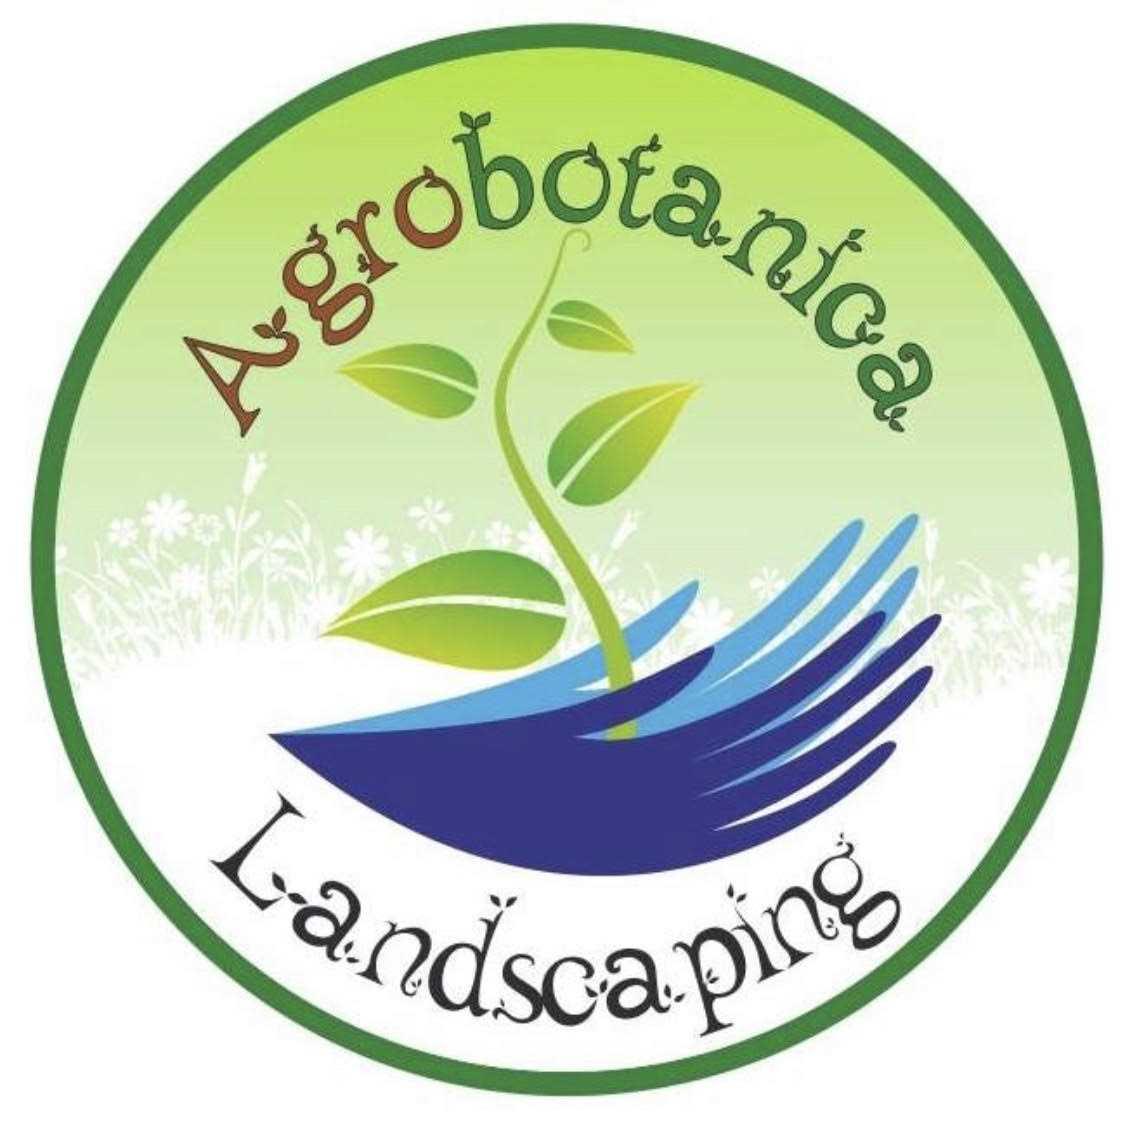 Agrobotanica Landscaping S.A